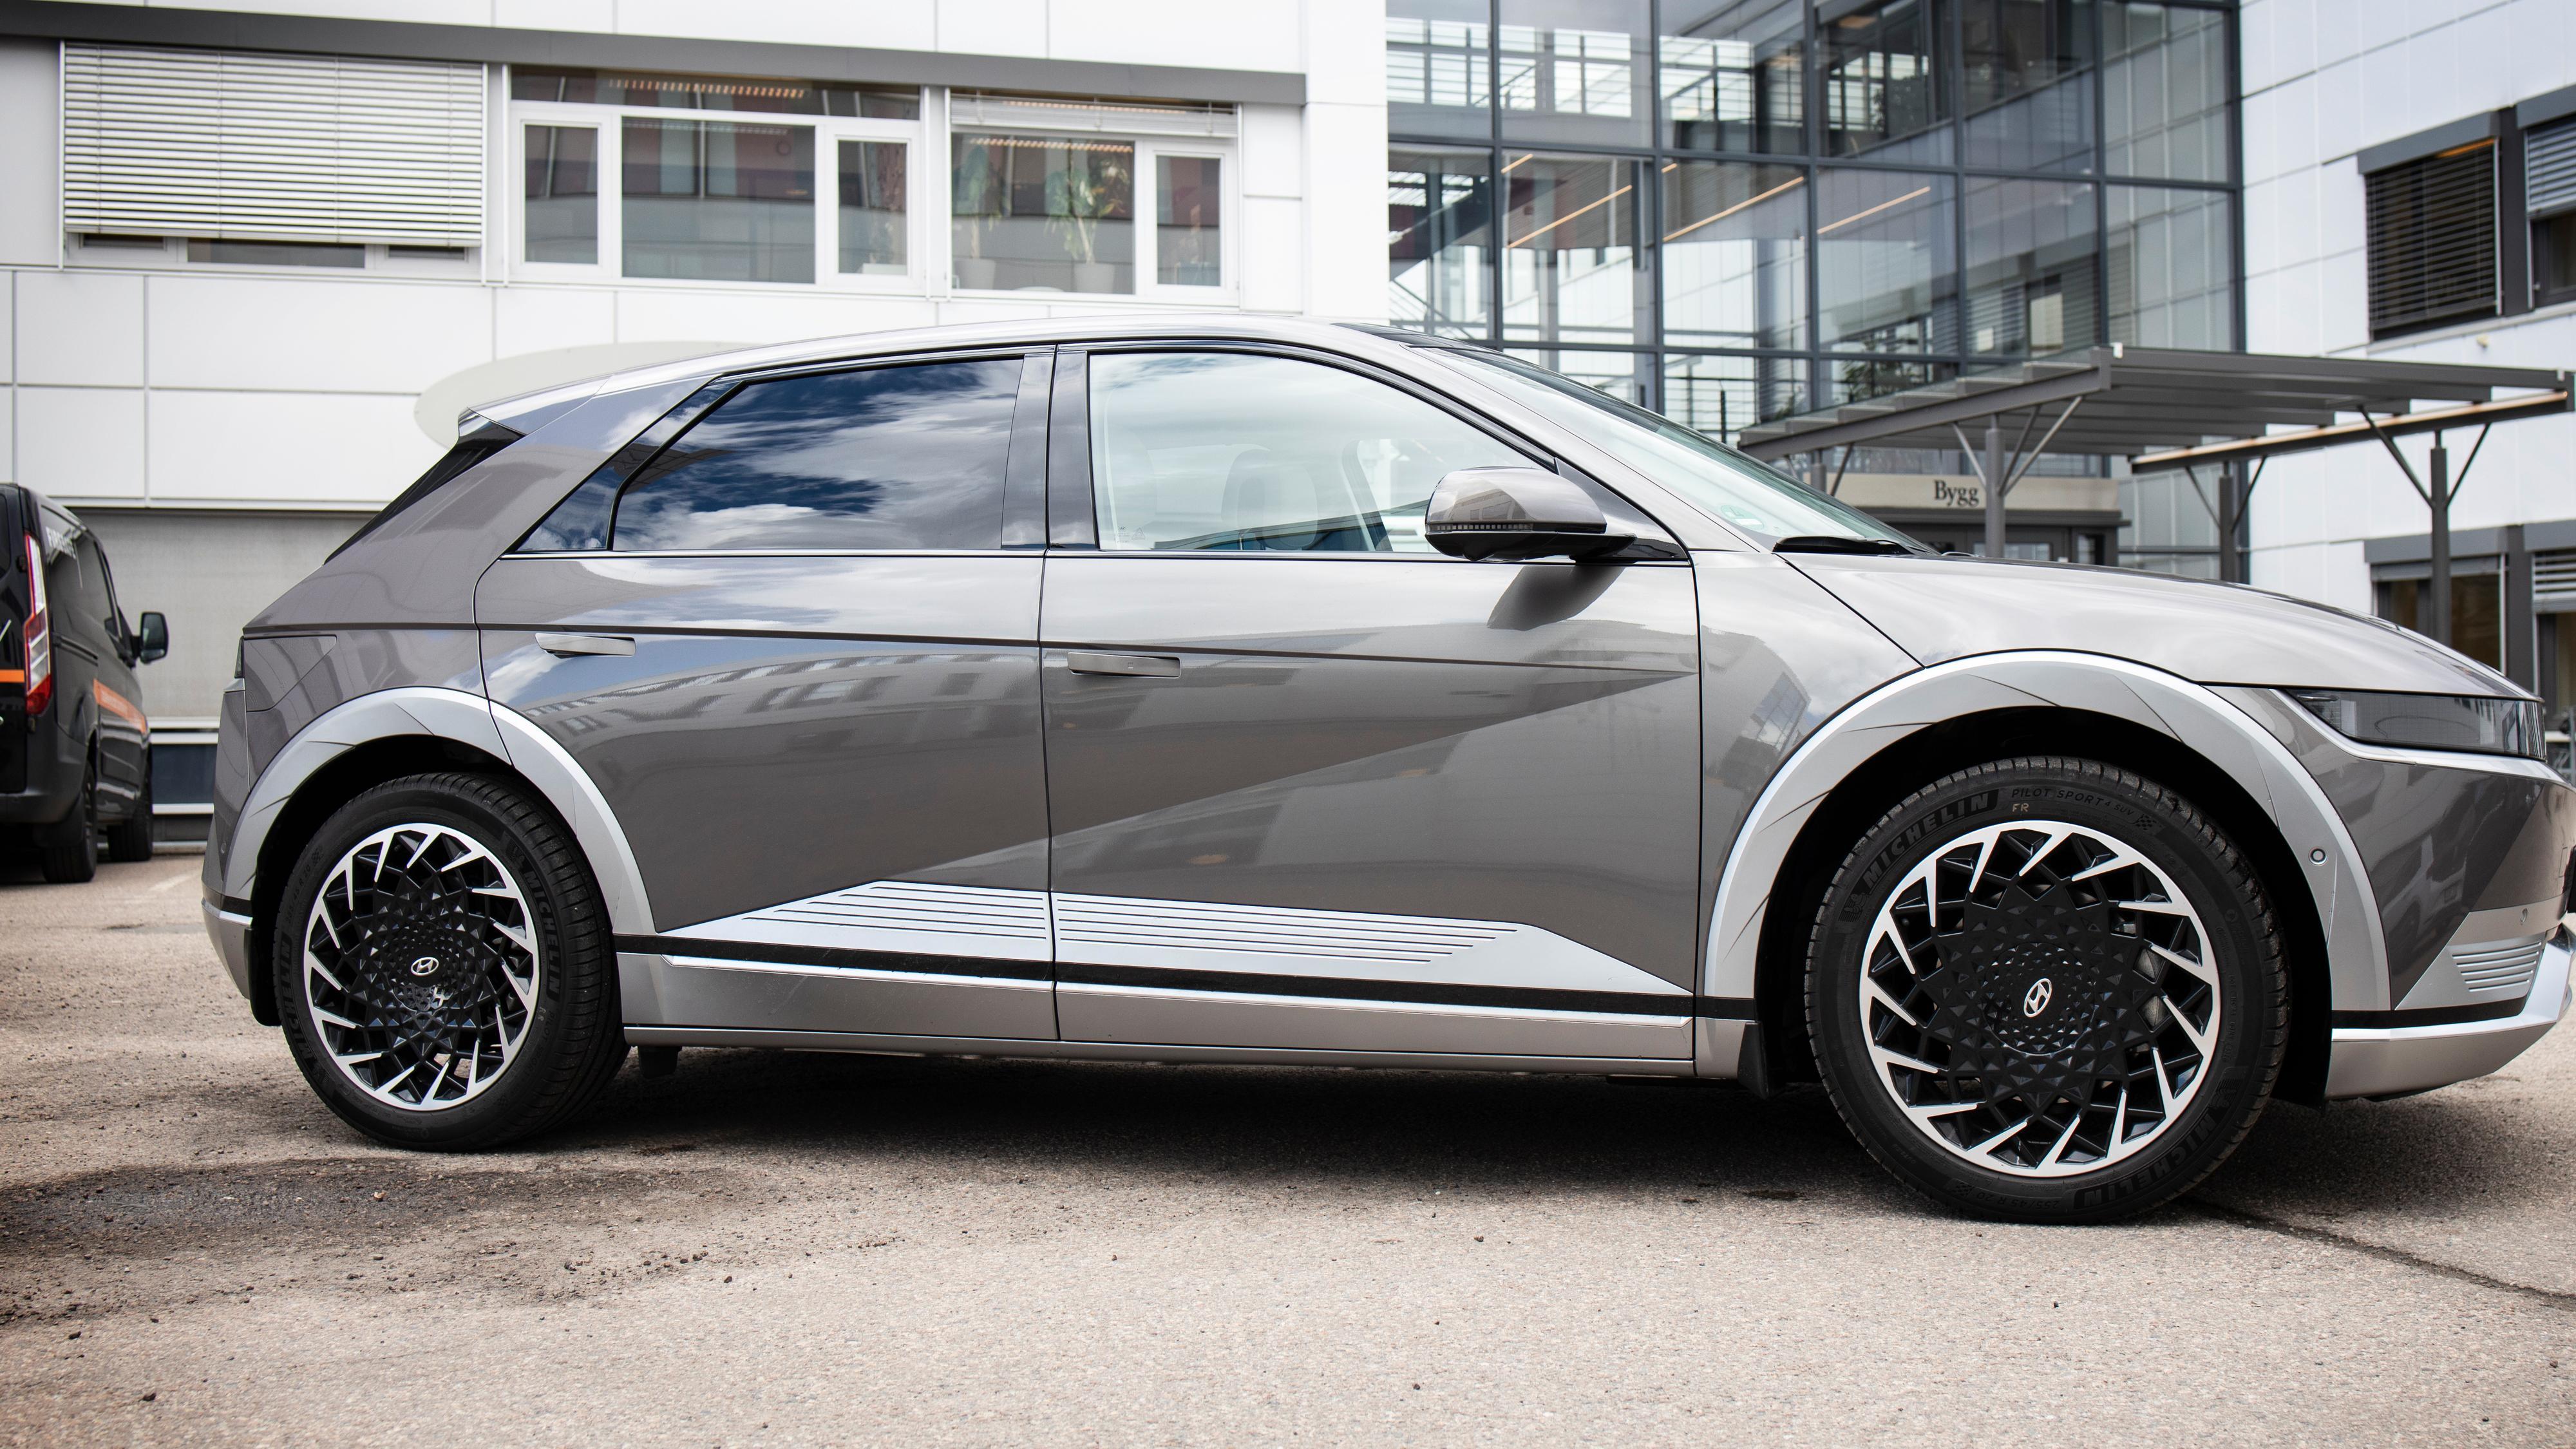 Sprek, smart og effektiv: Vi kjørte Hyundai Ioniq 5